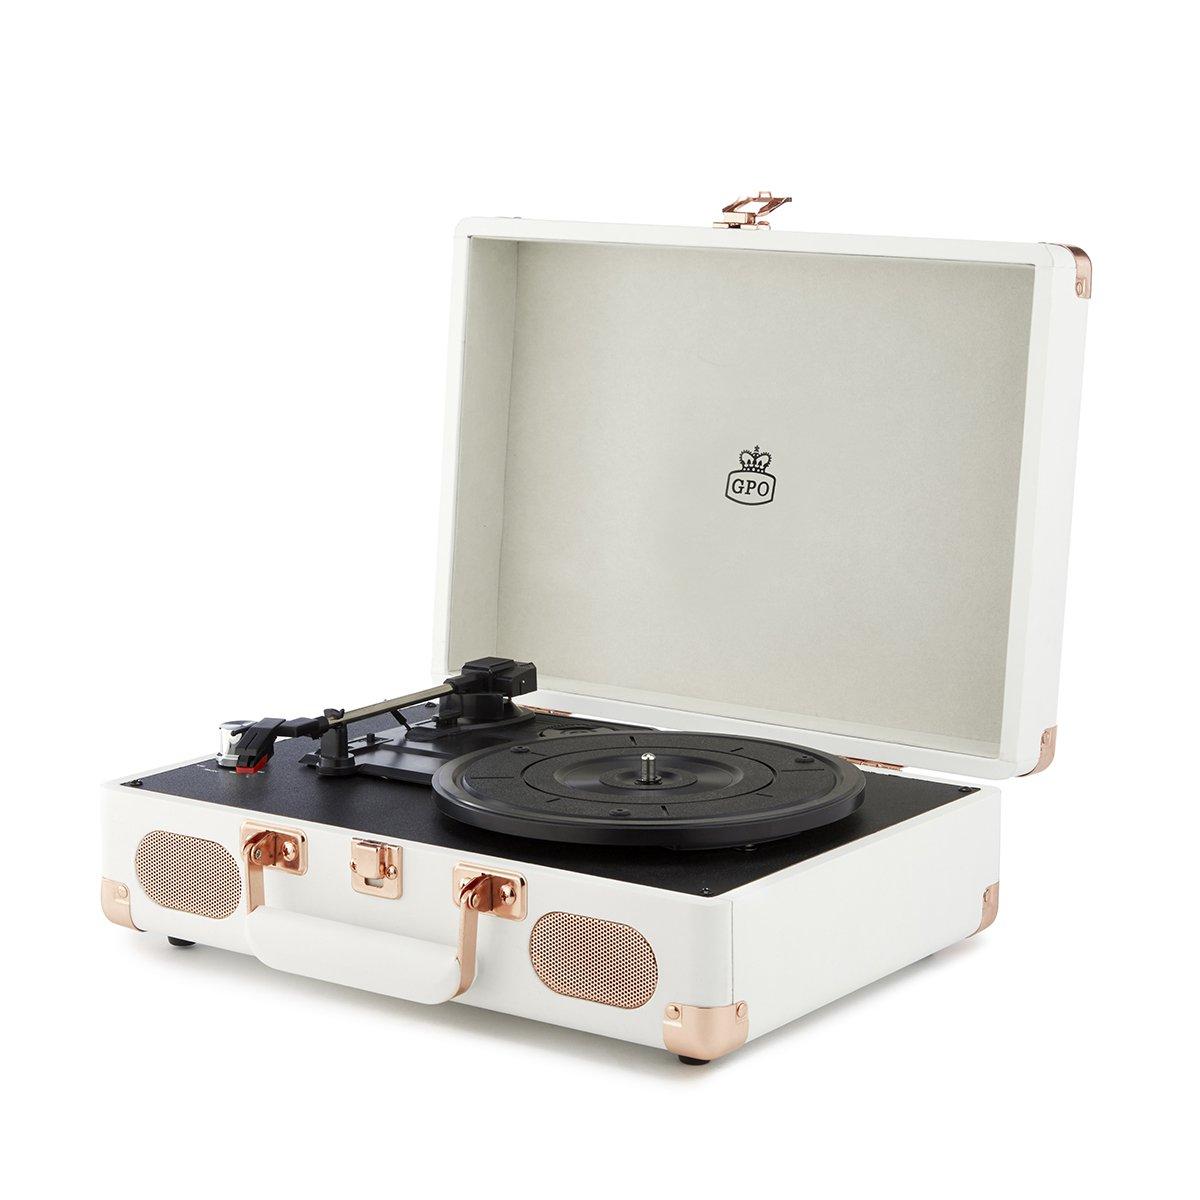 Gramofon Soho White